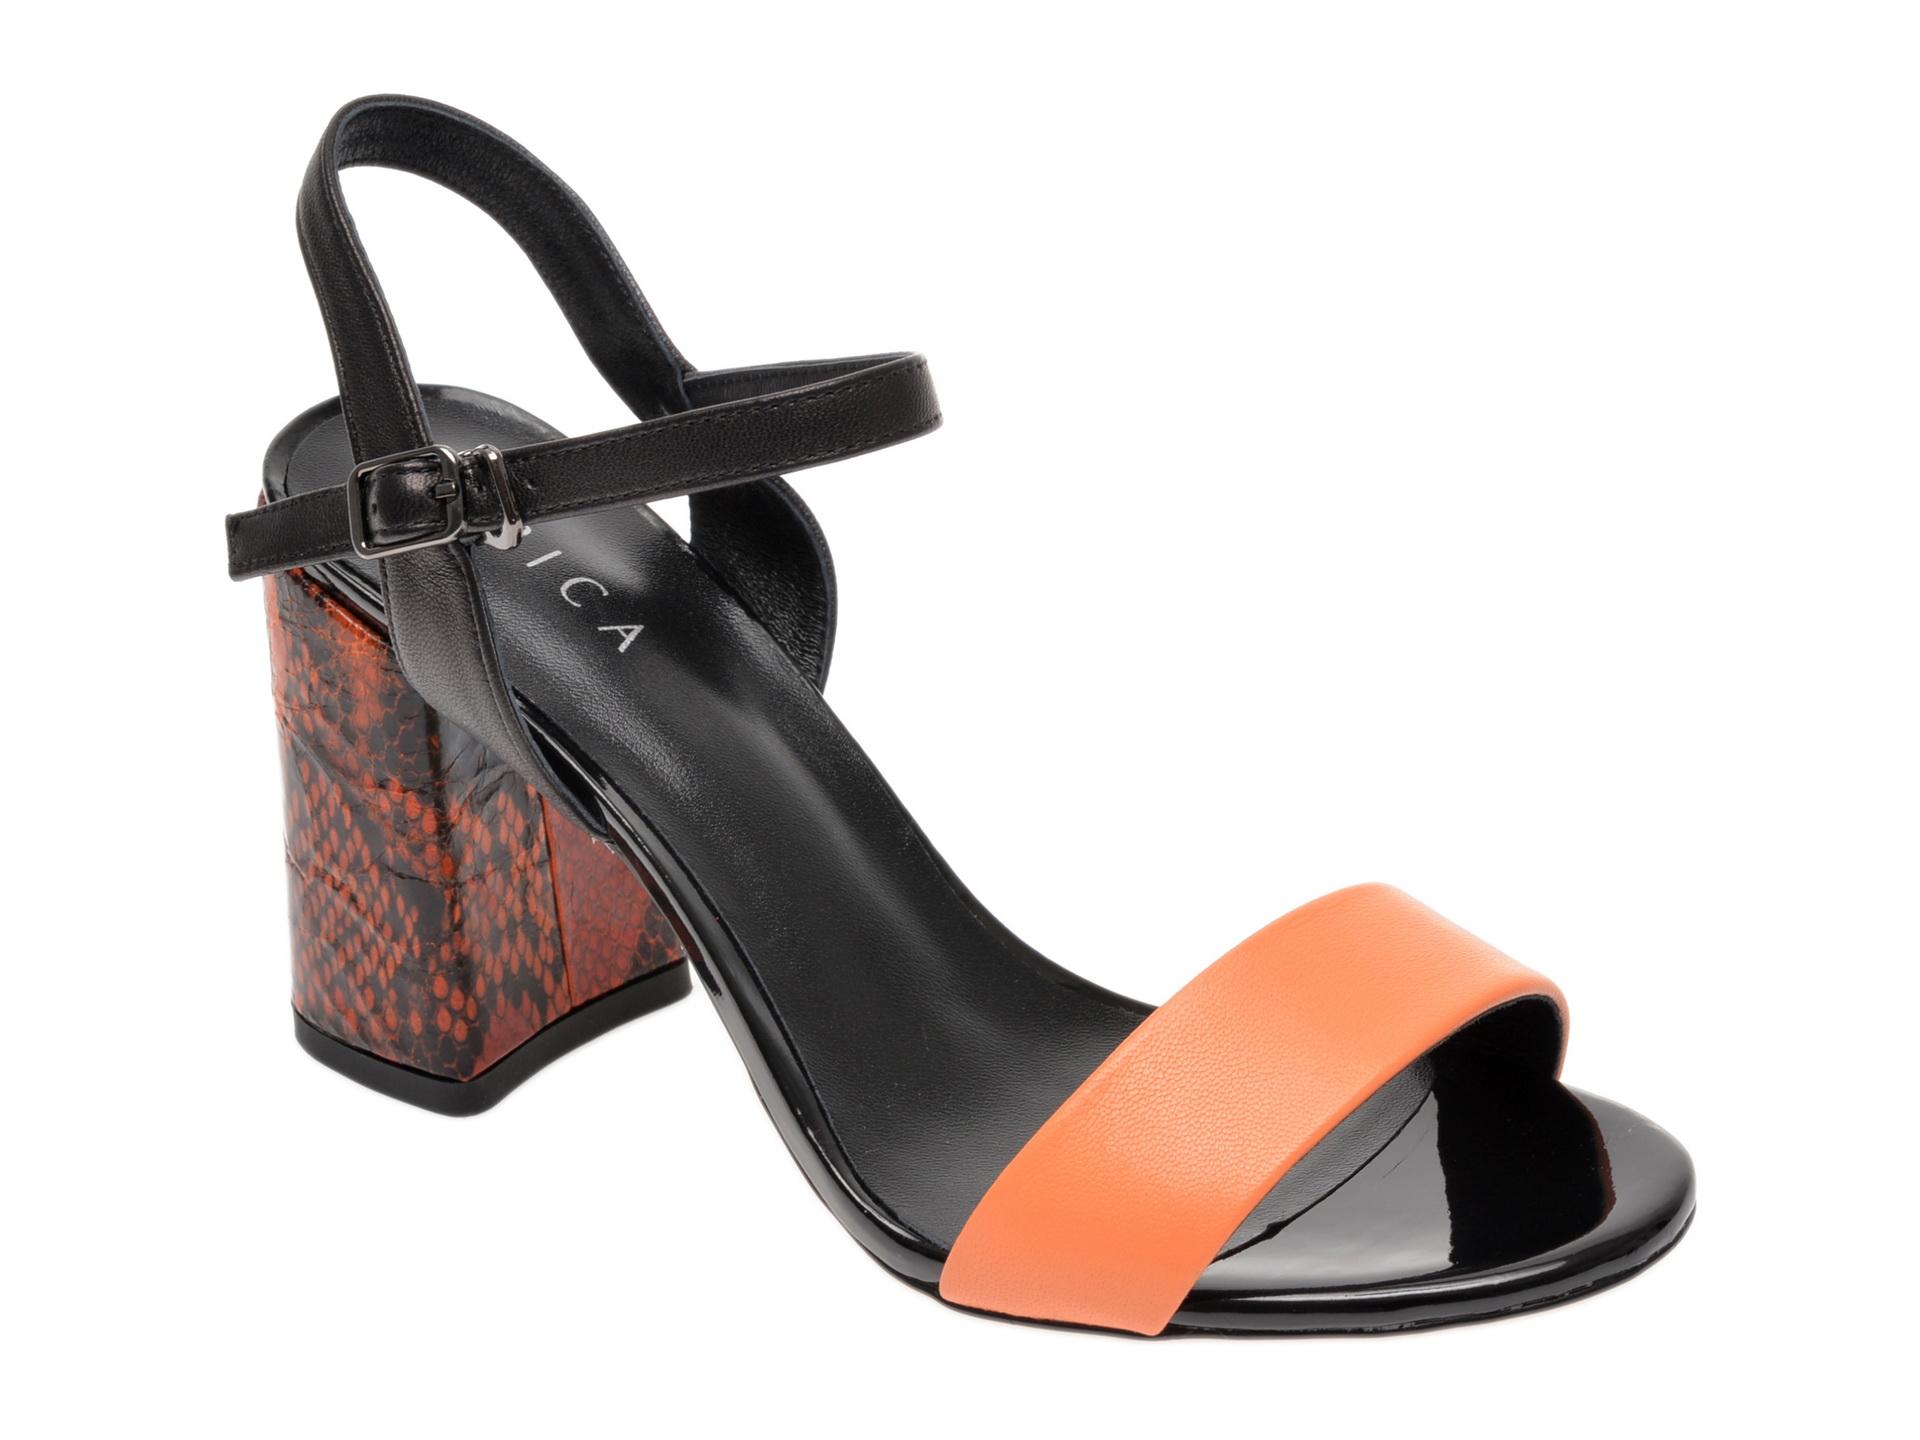 Sandale EPICA portocalii, 8D1149G, din piele naturala